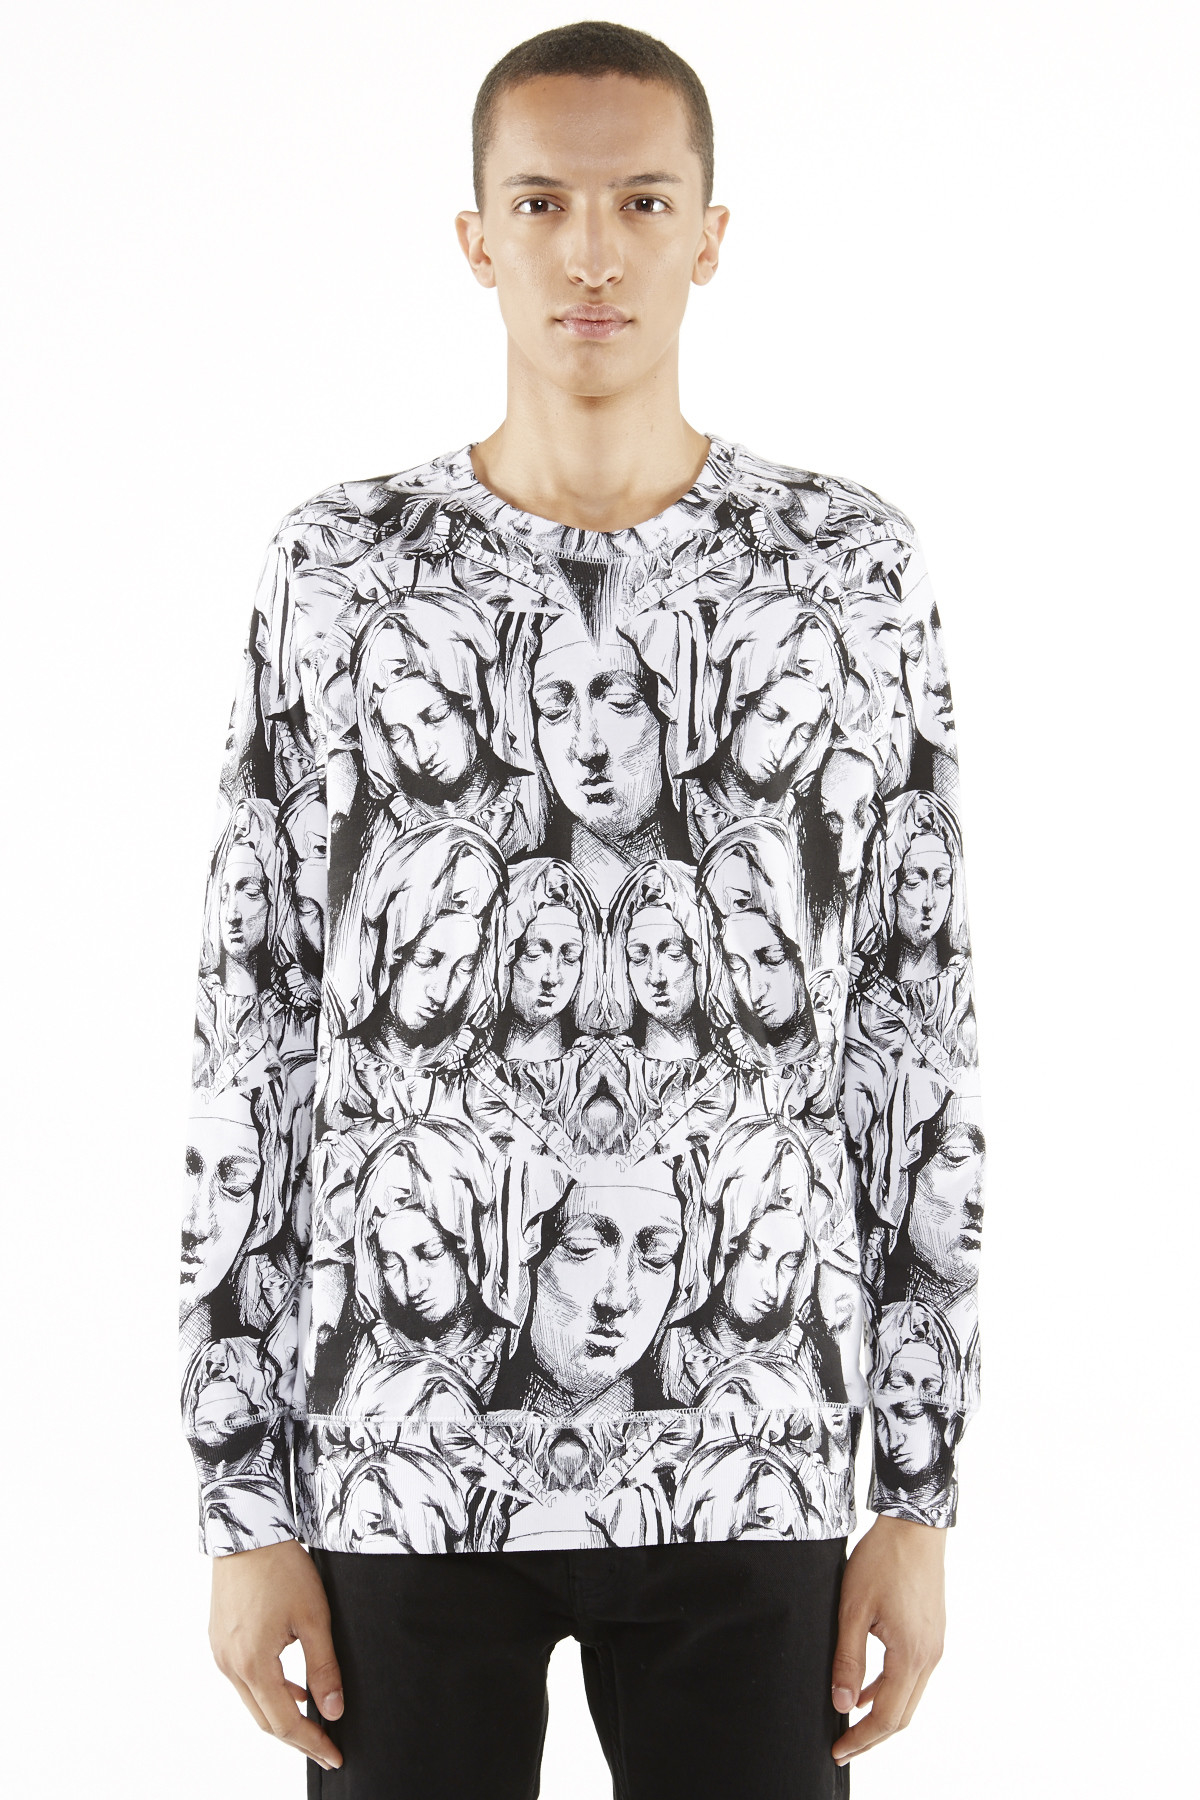 eleven paris west 77 church print sweatshirt in multicolor for men olrierge print lyst. Black Bedroom Furniture Sets. Home Design Ideas